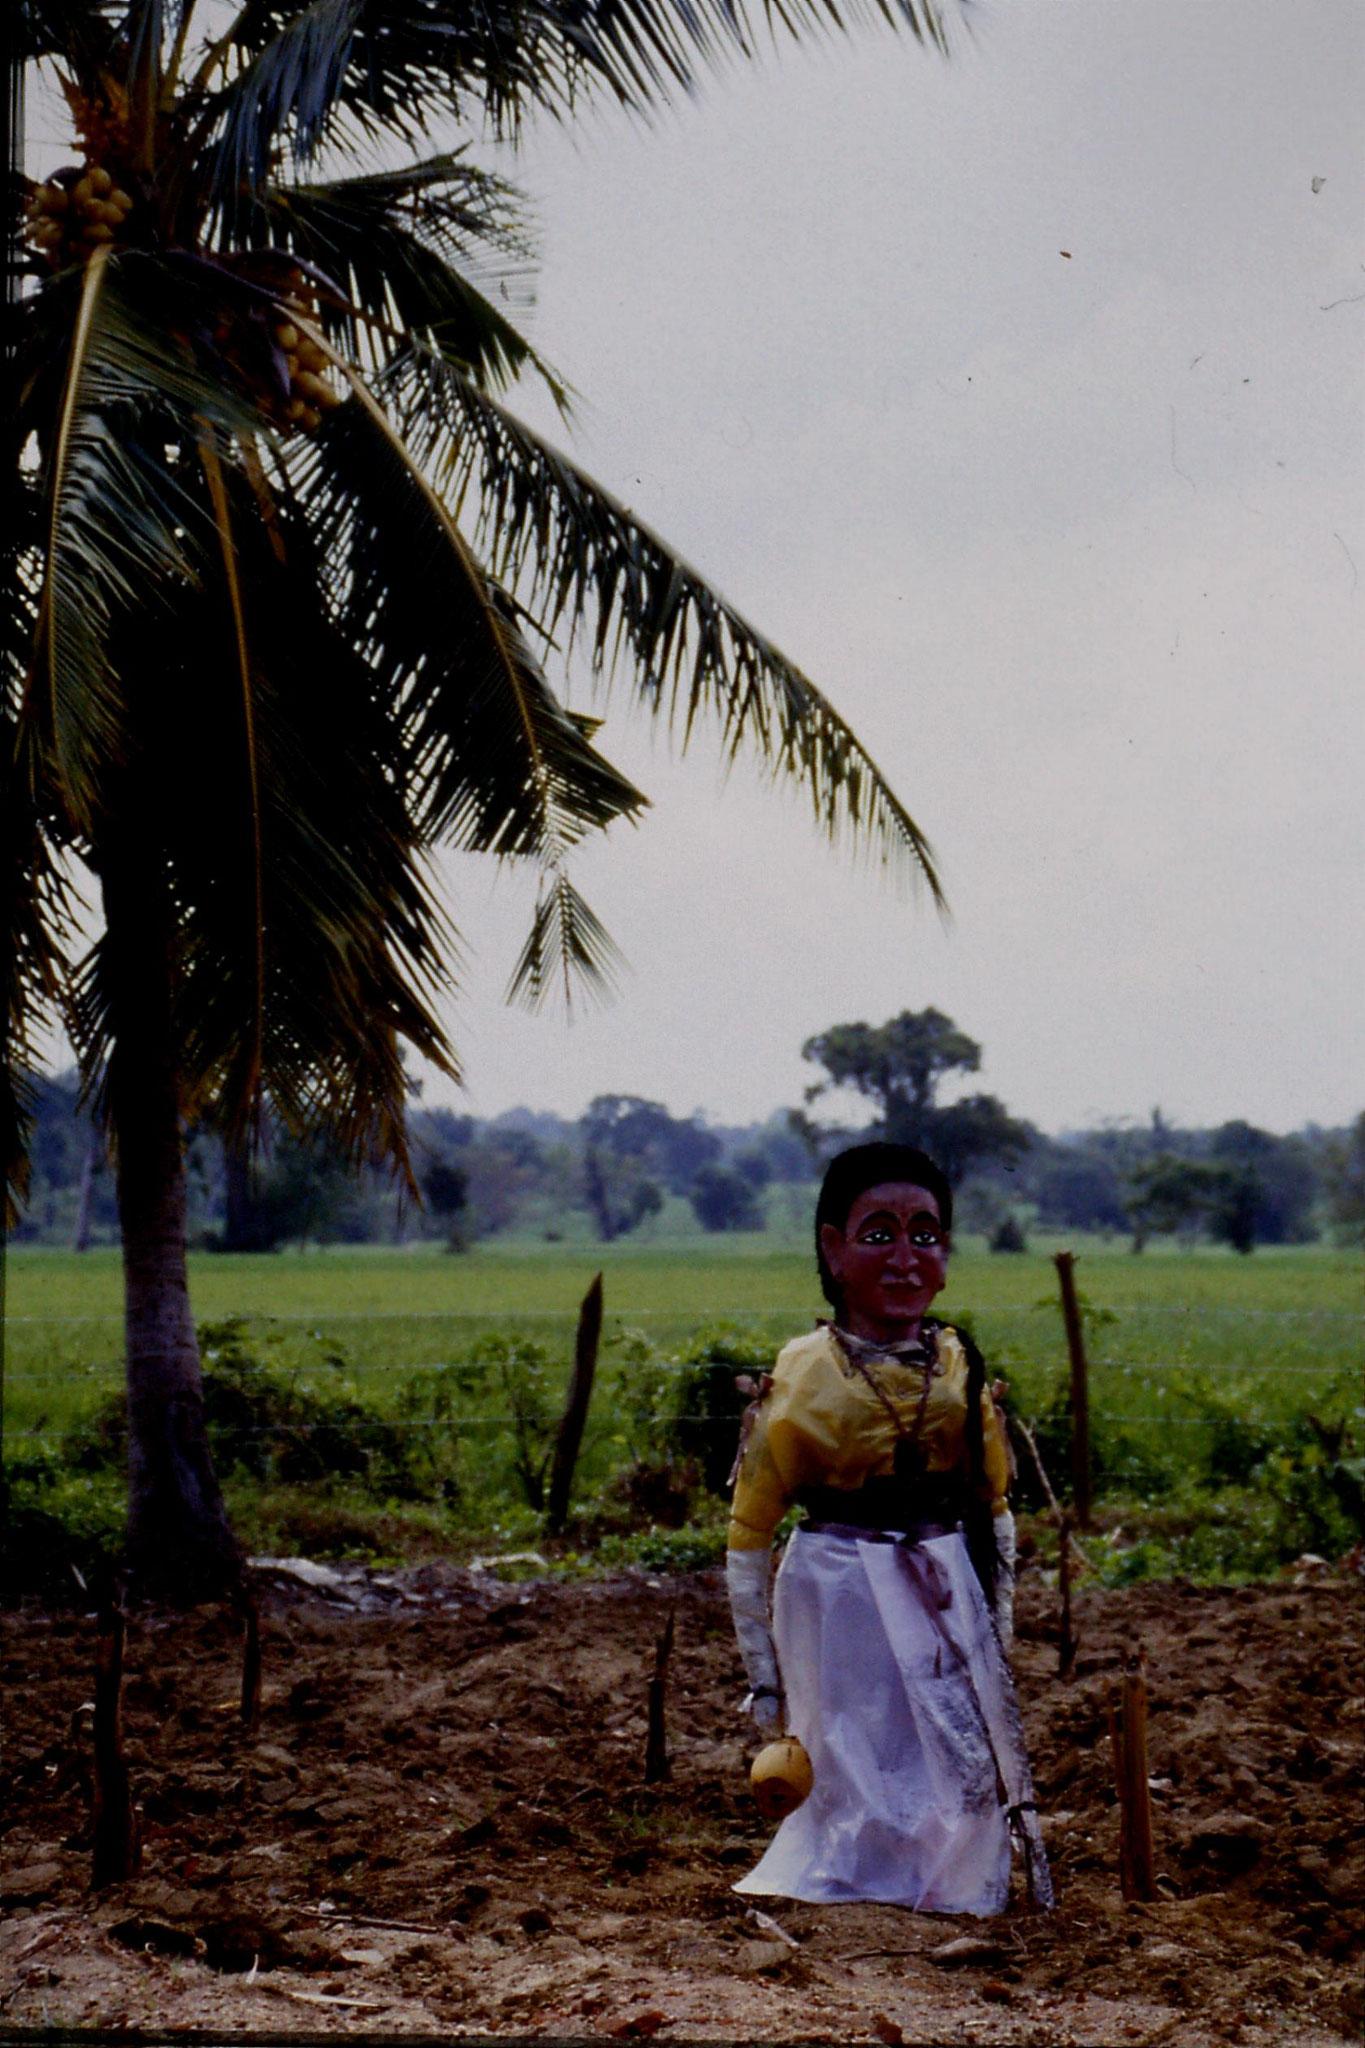 102/32: 7/2/1990 Sigiriya - 'Elegant' scarecrow at Giritale